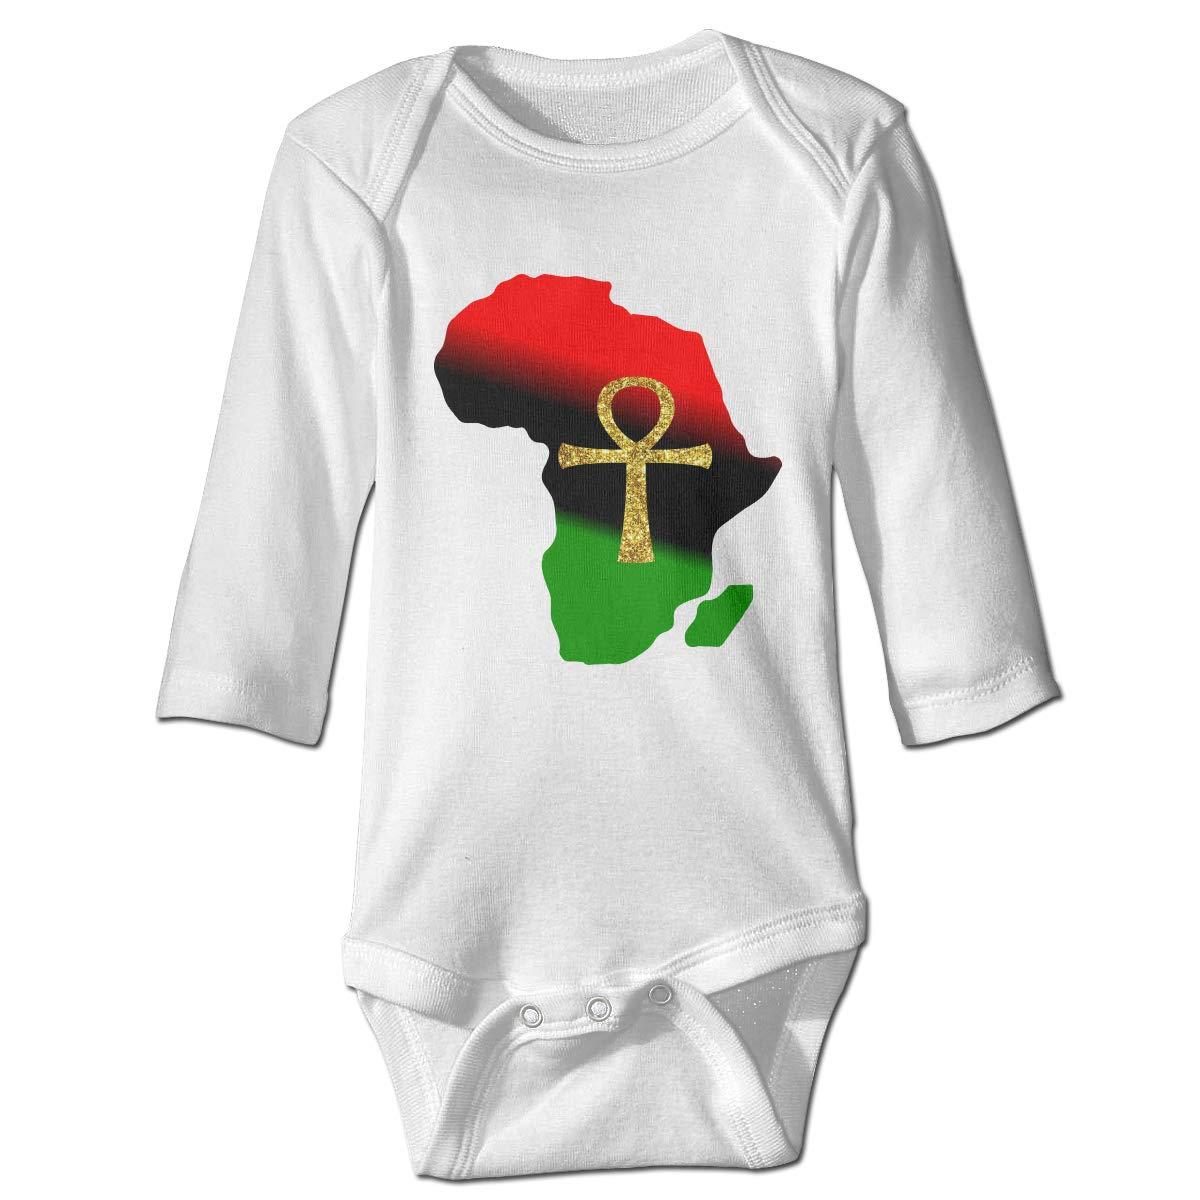 Pullan Eudora Africa and ANKH Unisex Baby Long Sleeve Bodysuits